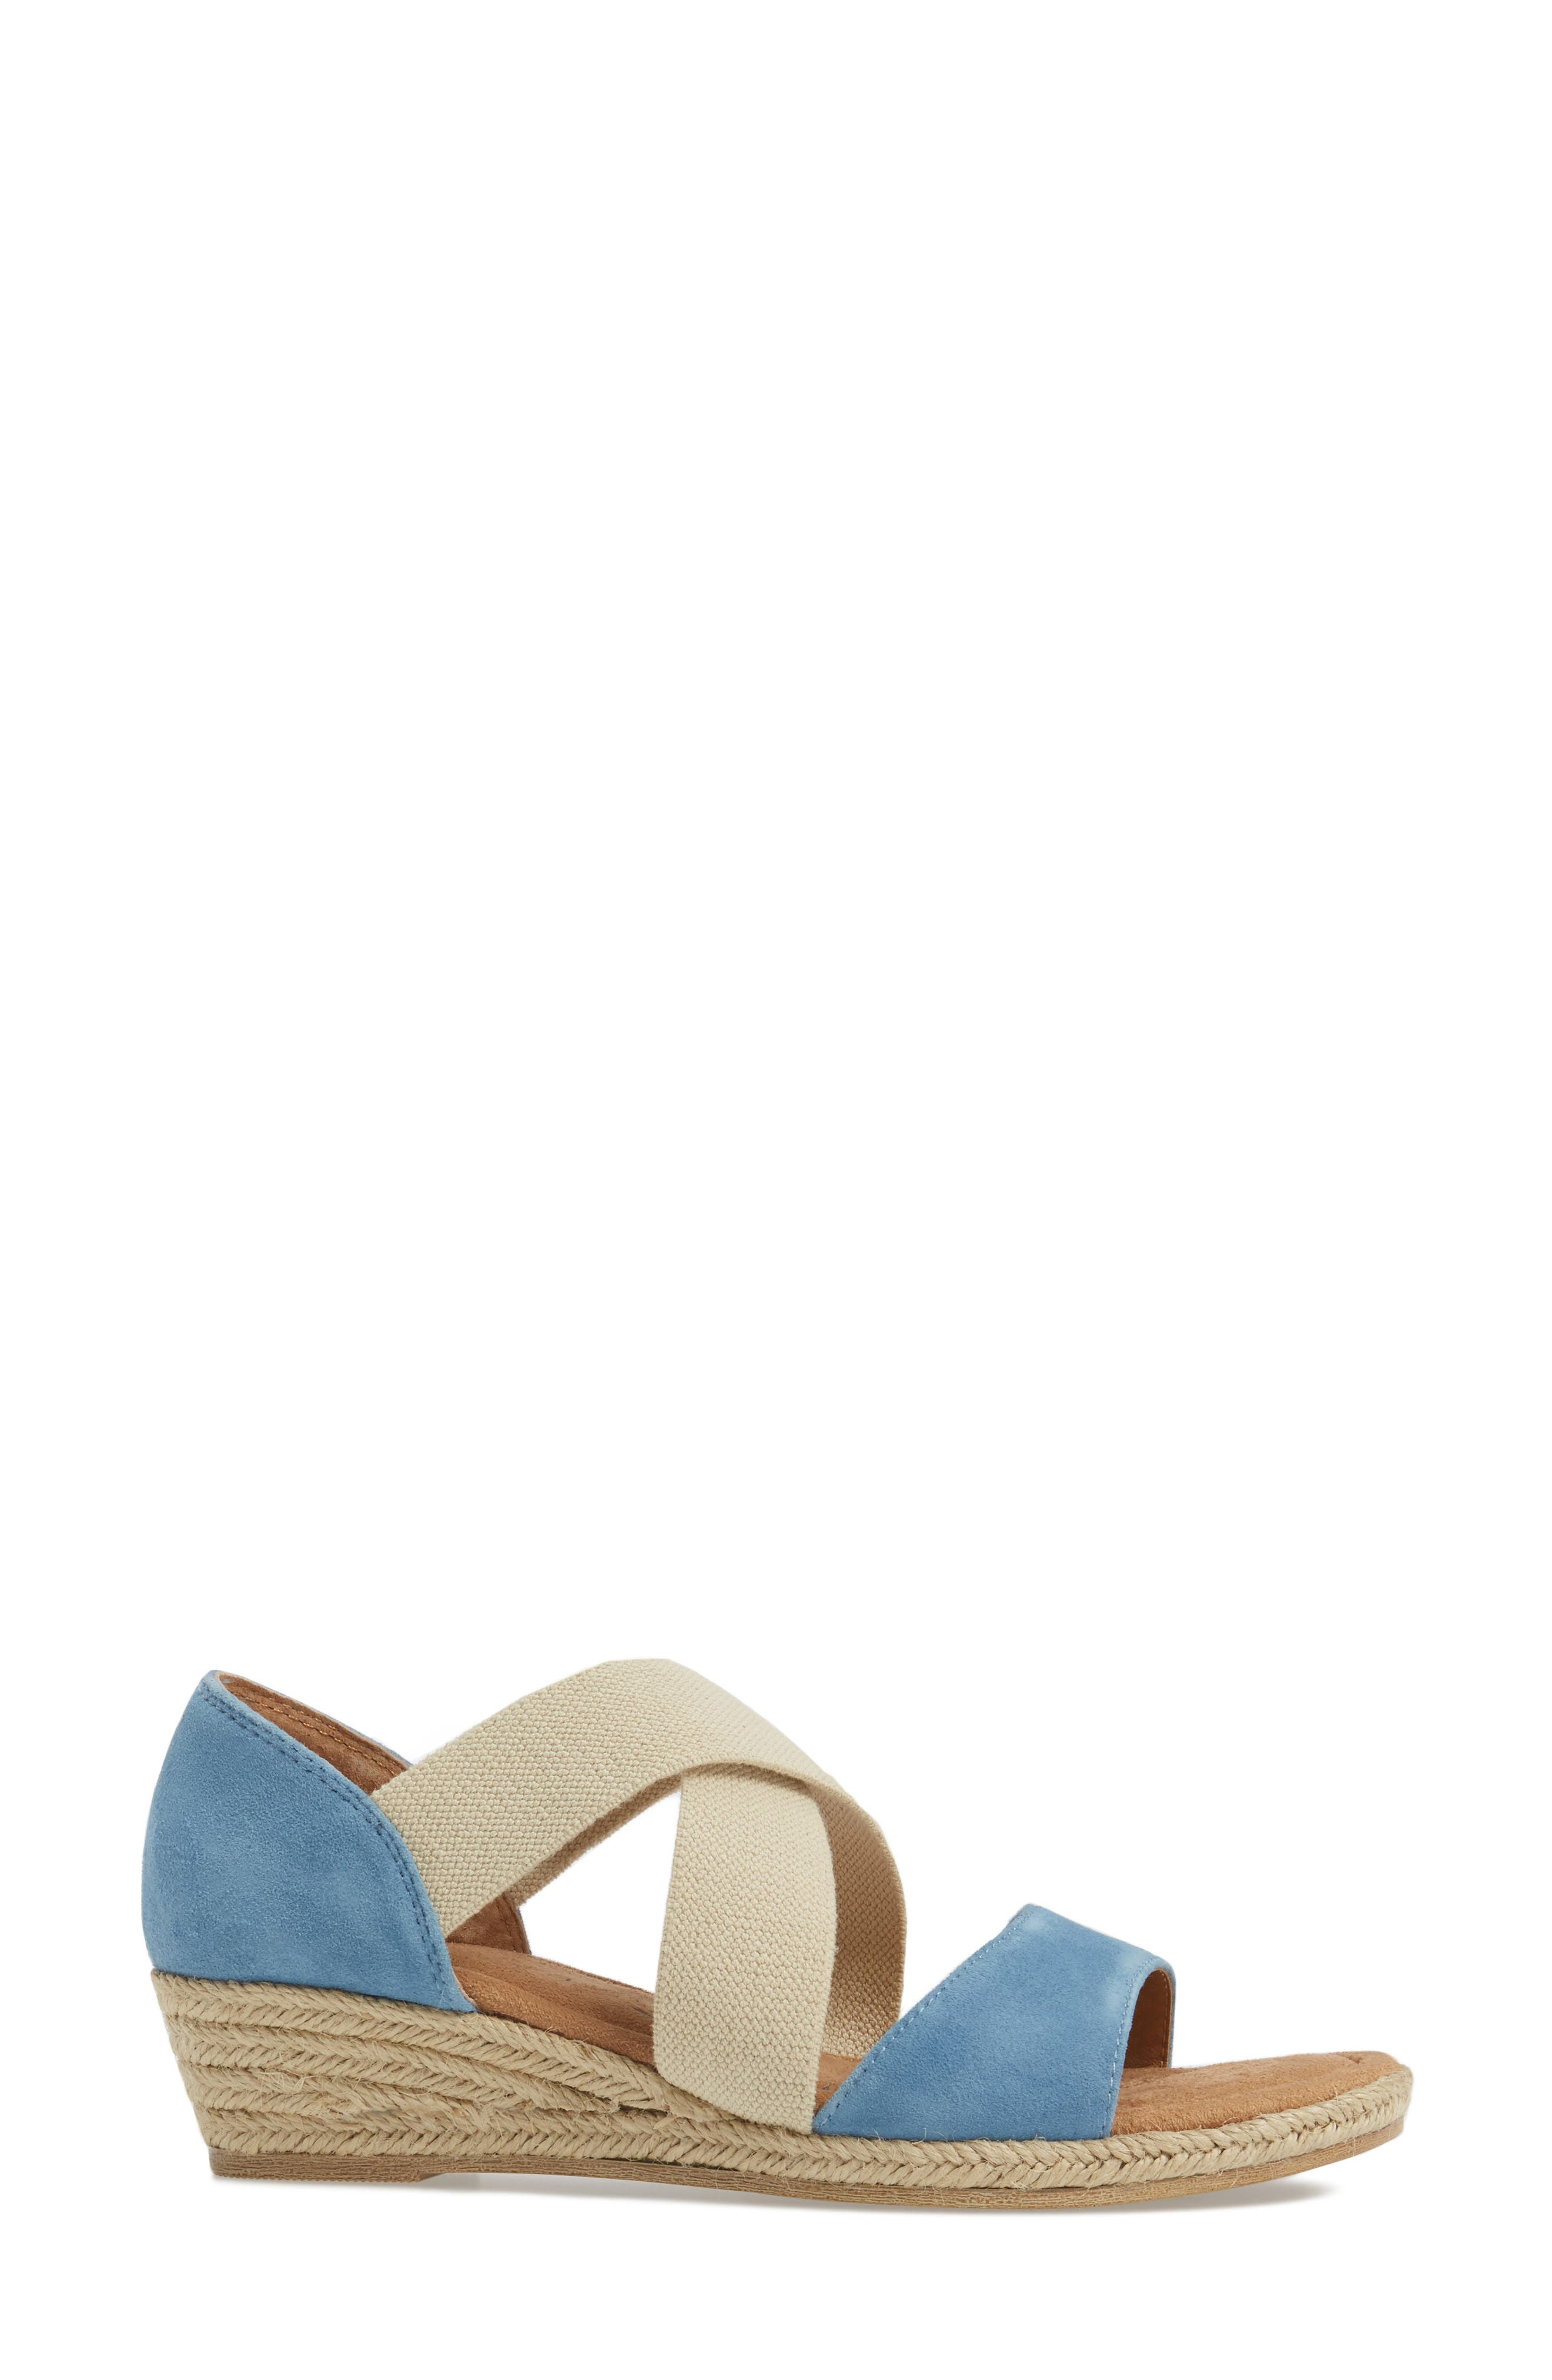 Alternate Image 3  - Comfortiva Brye Espadrille Sandal (Women)